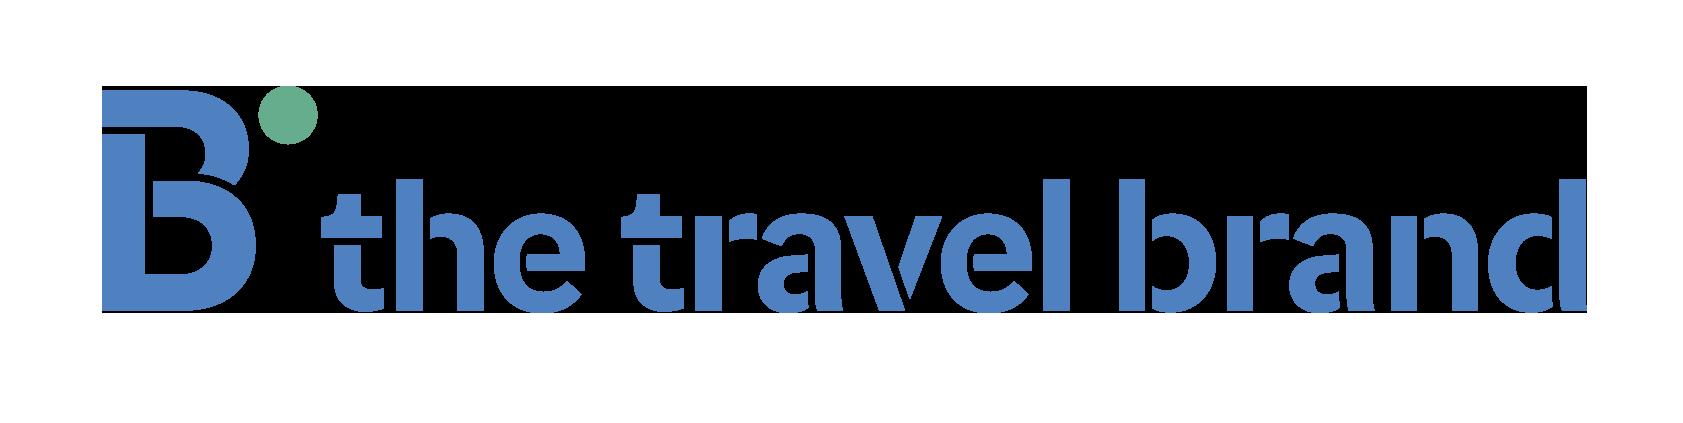 Travel Brand